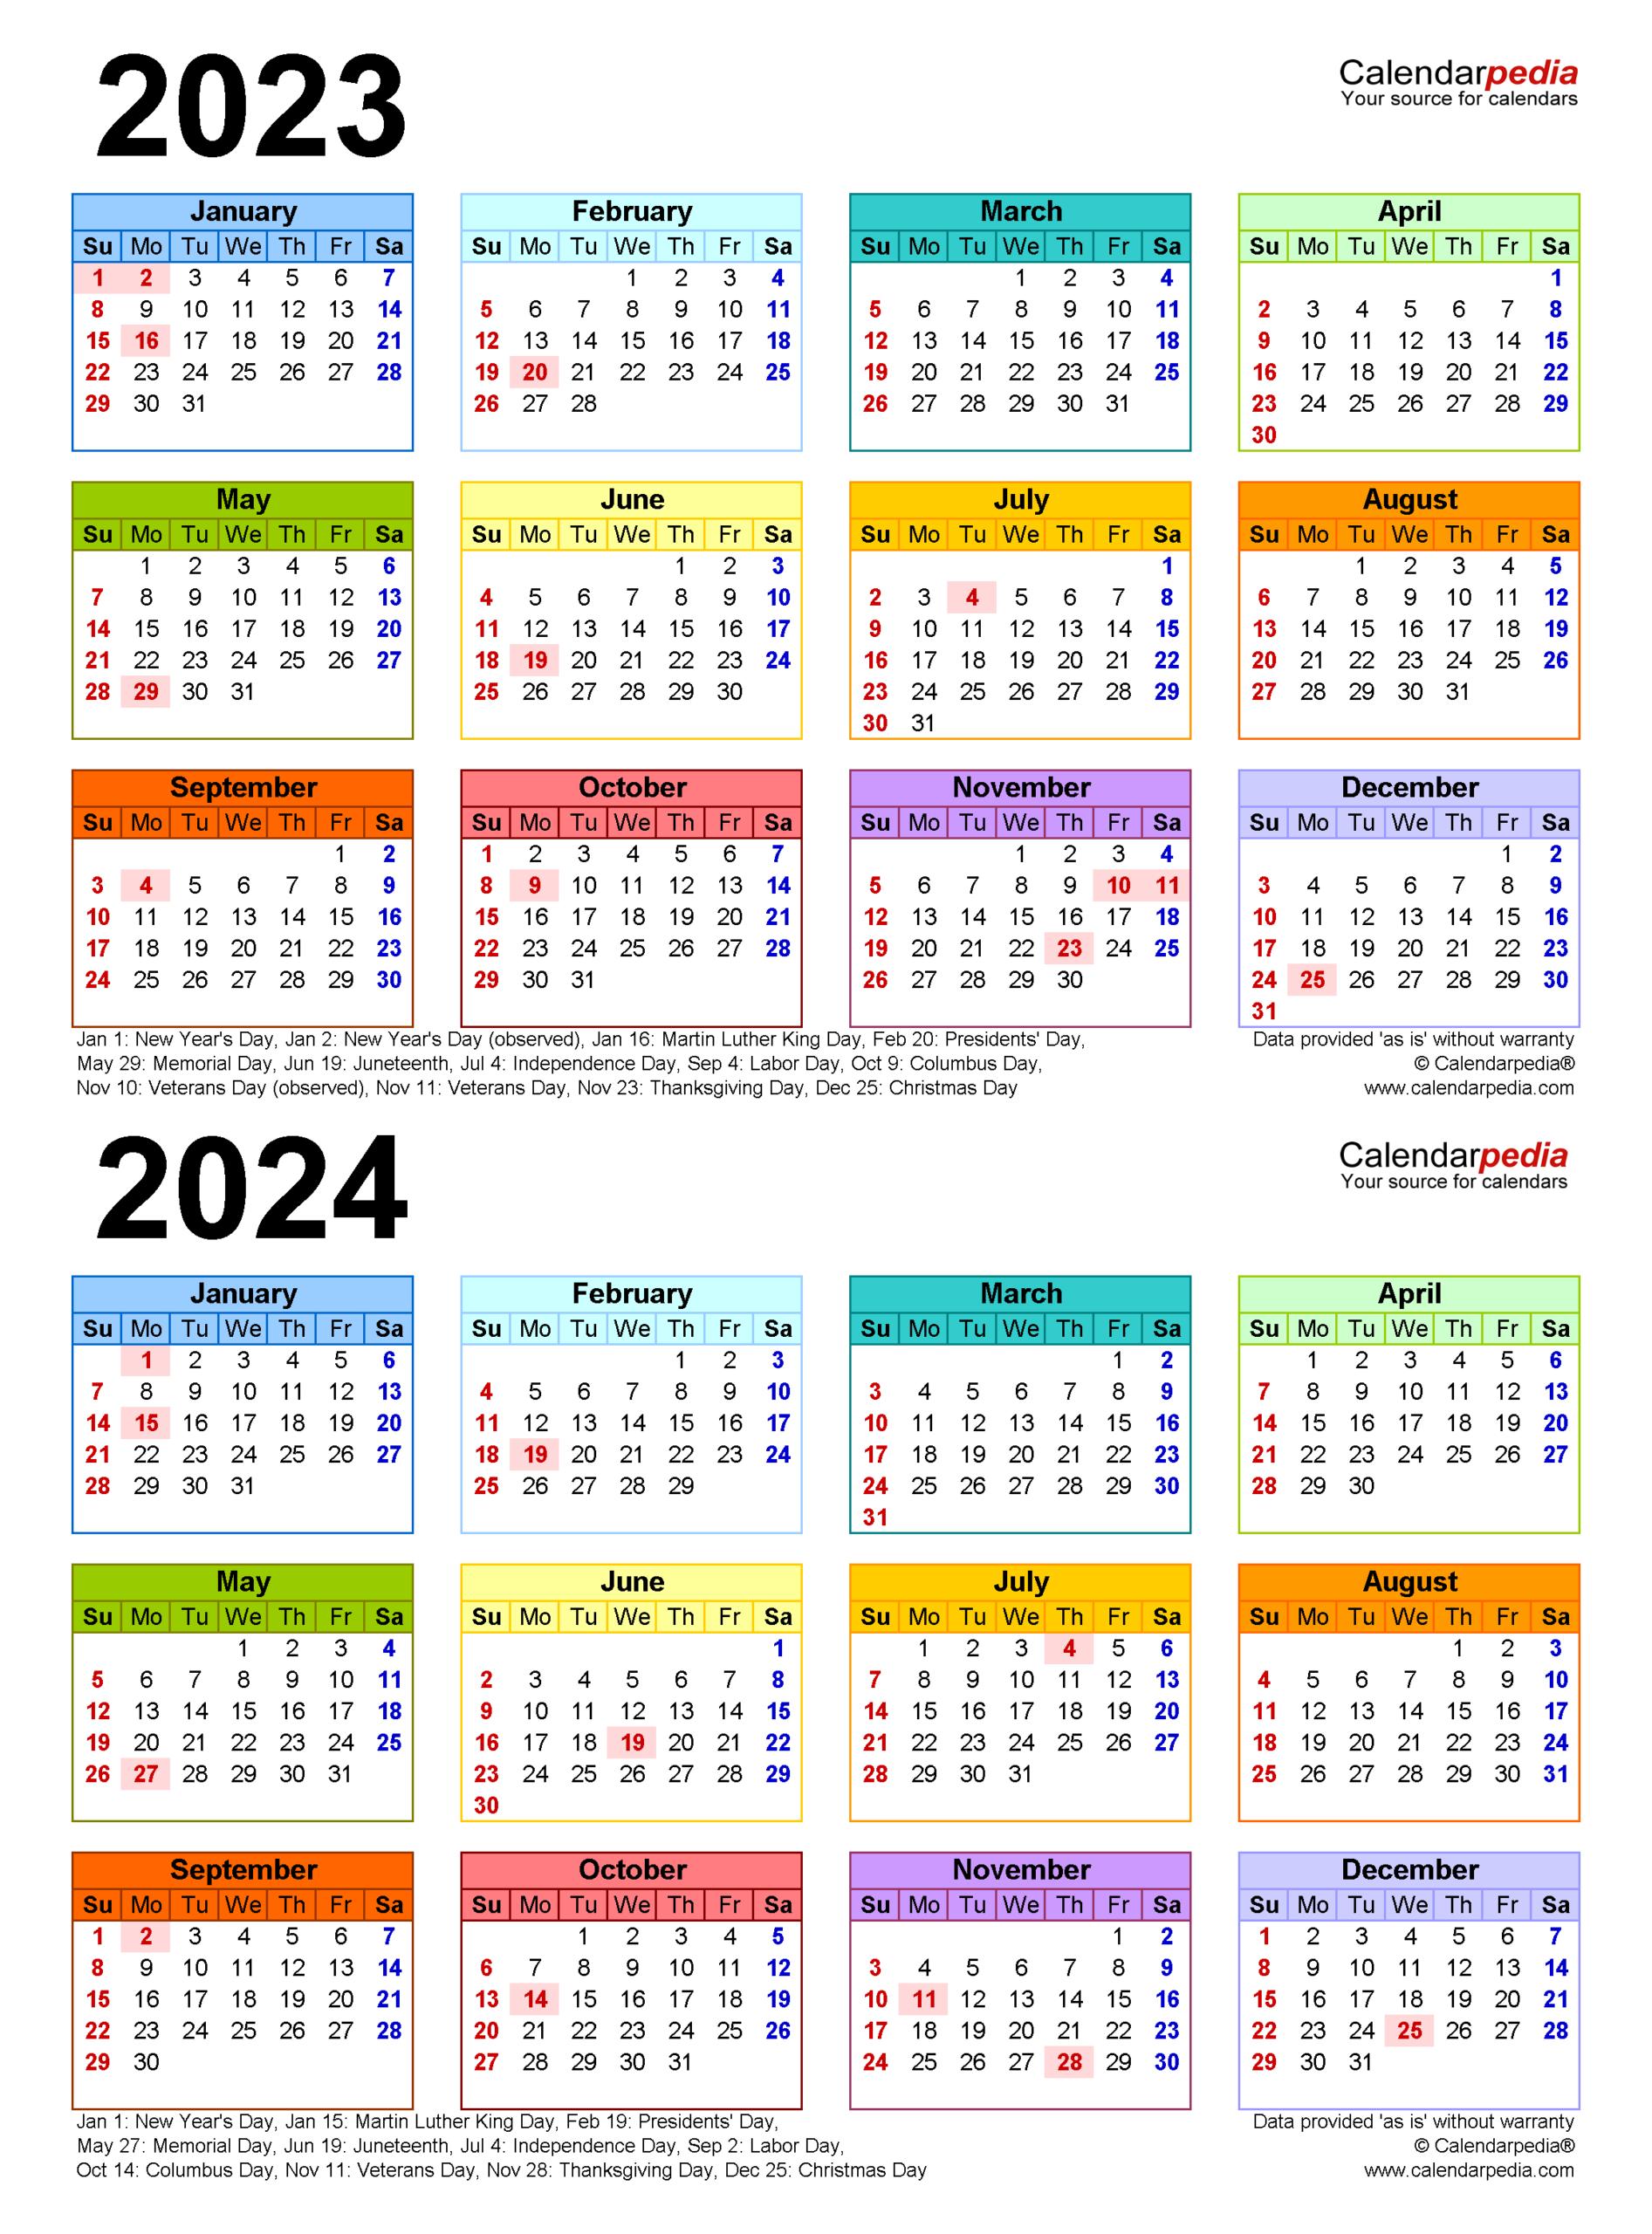 2023-2024 Two Year Calendar - Free Printable Microsoft